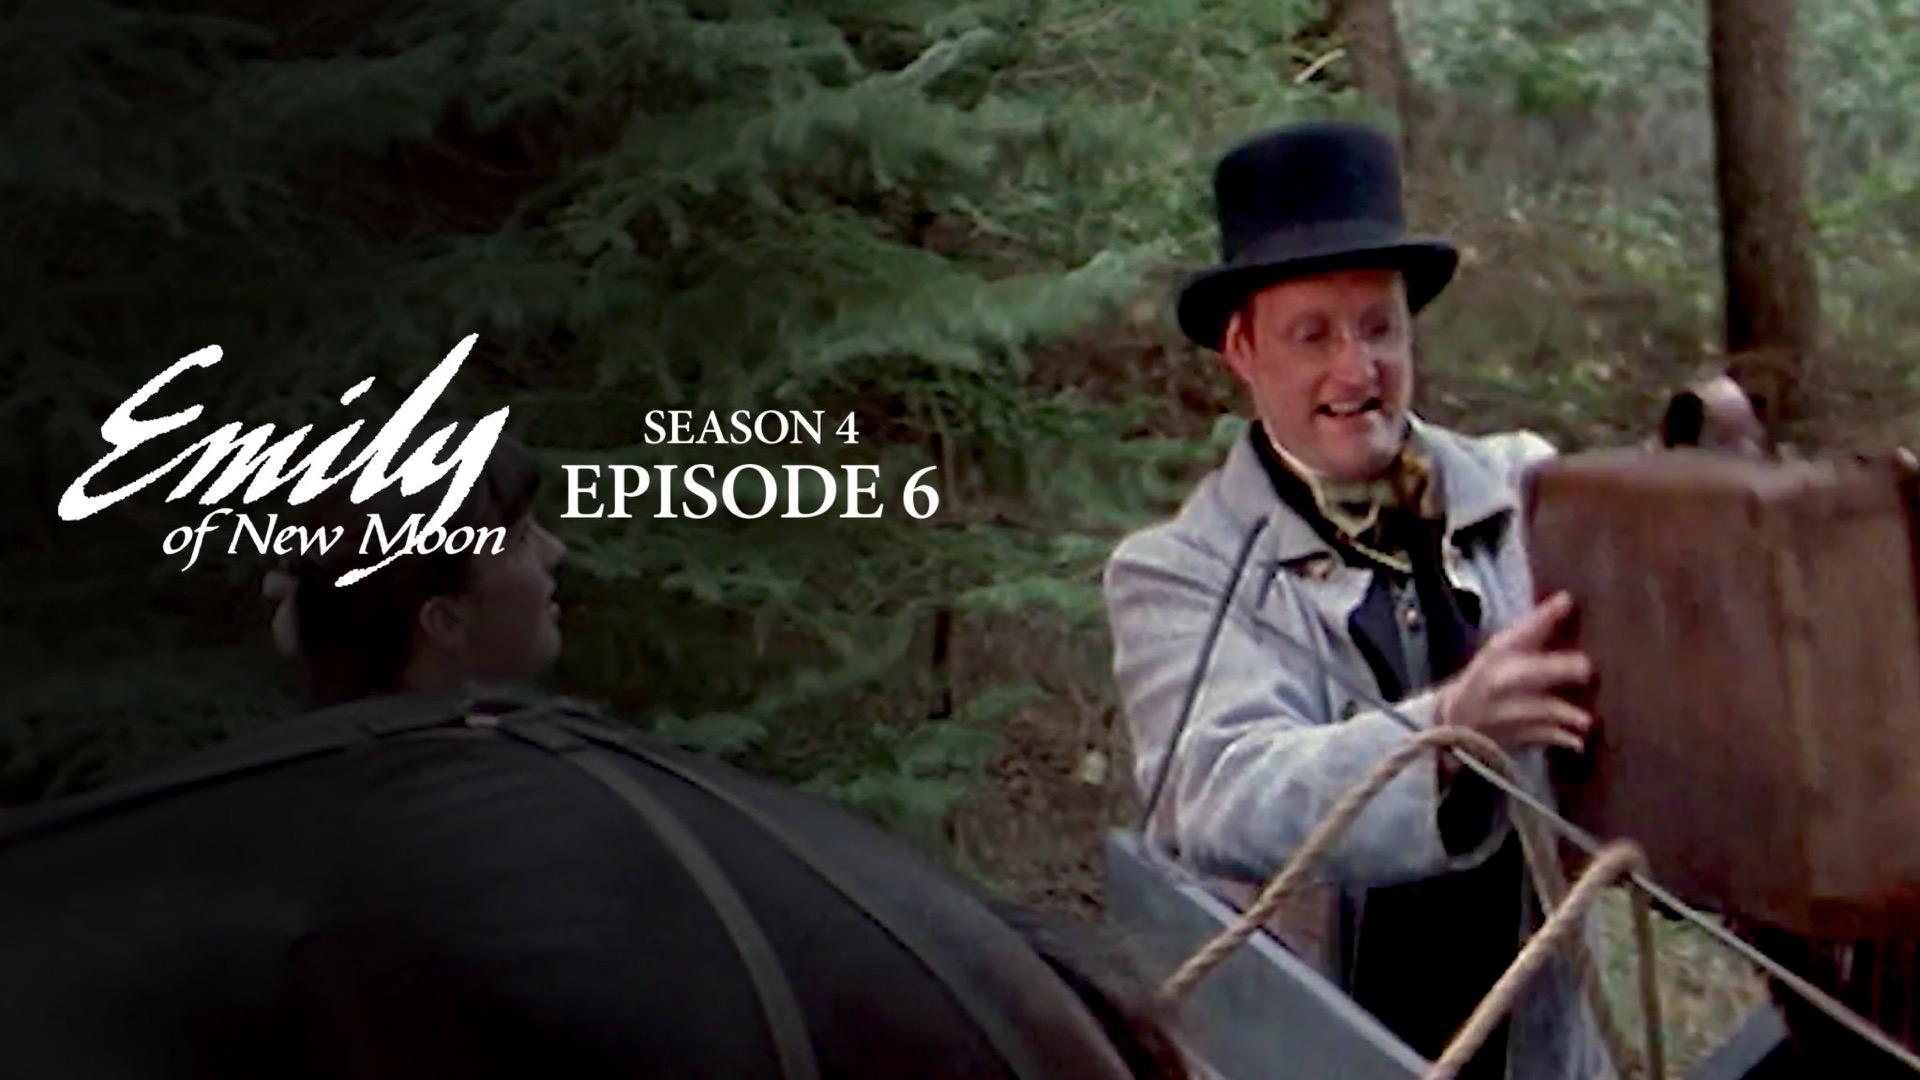 Emily of New Moon Season 4 Episode 6